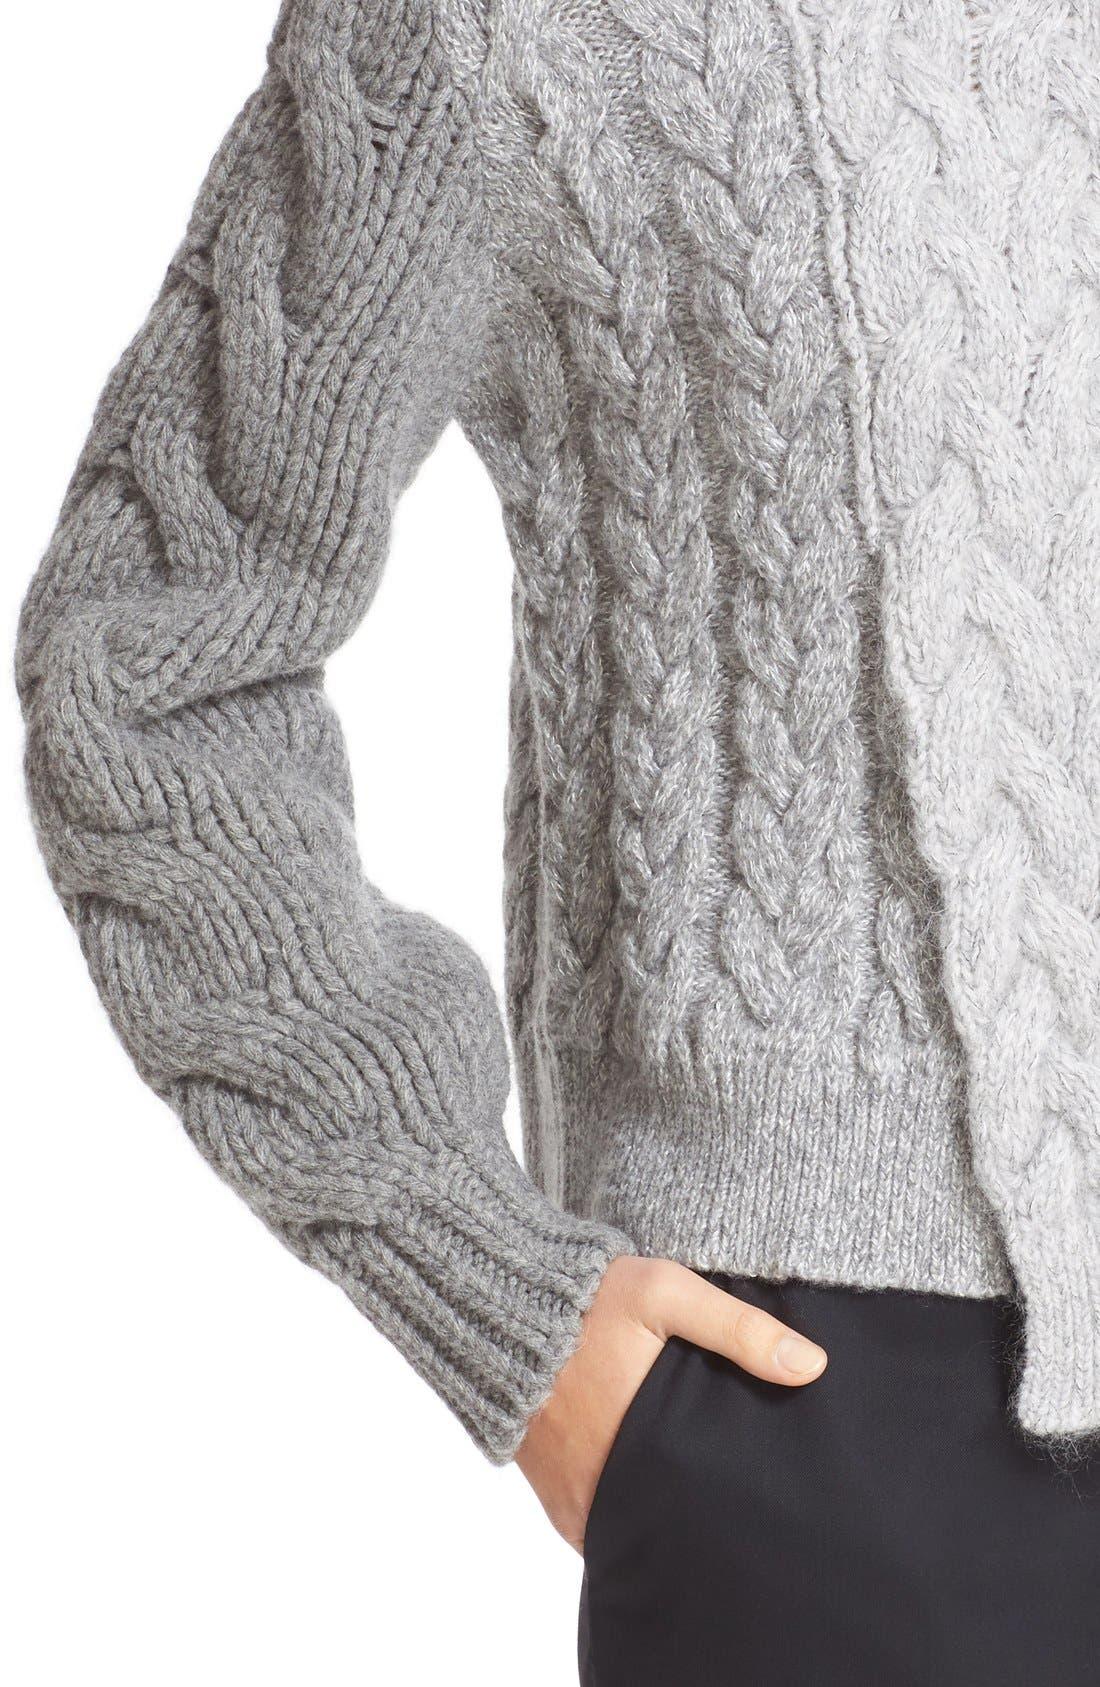 STELLA MCCARTNEY, Mixed Media Turtleneck Sweater, Alternate thumbnail 3, color, 120